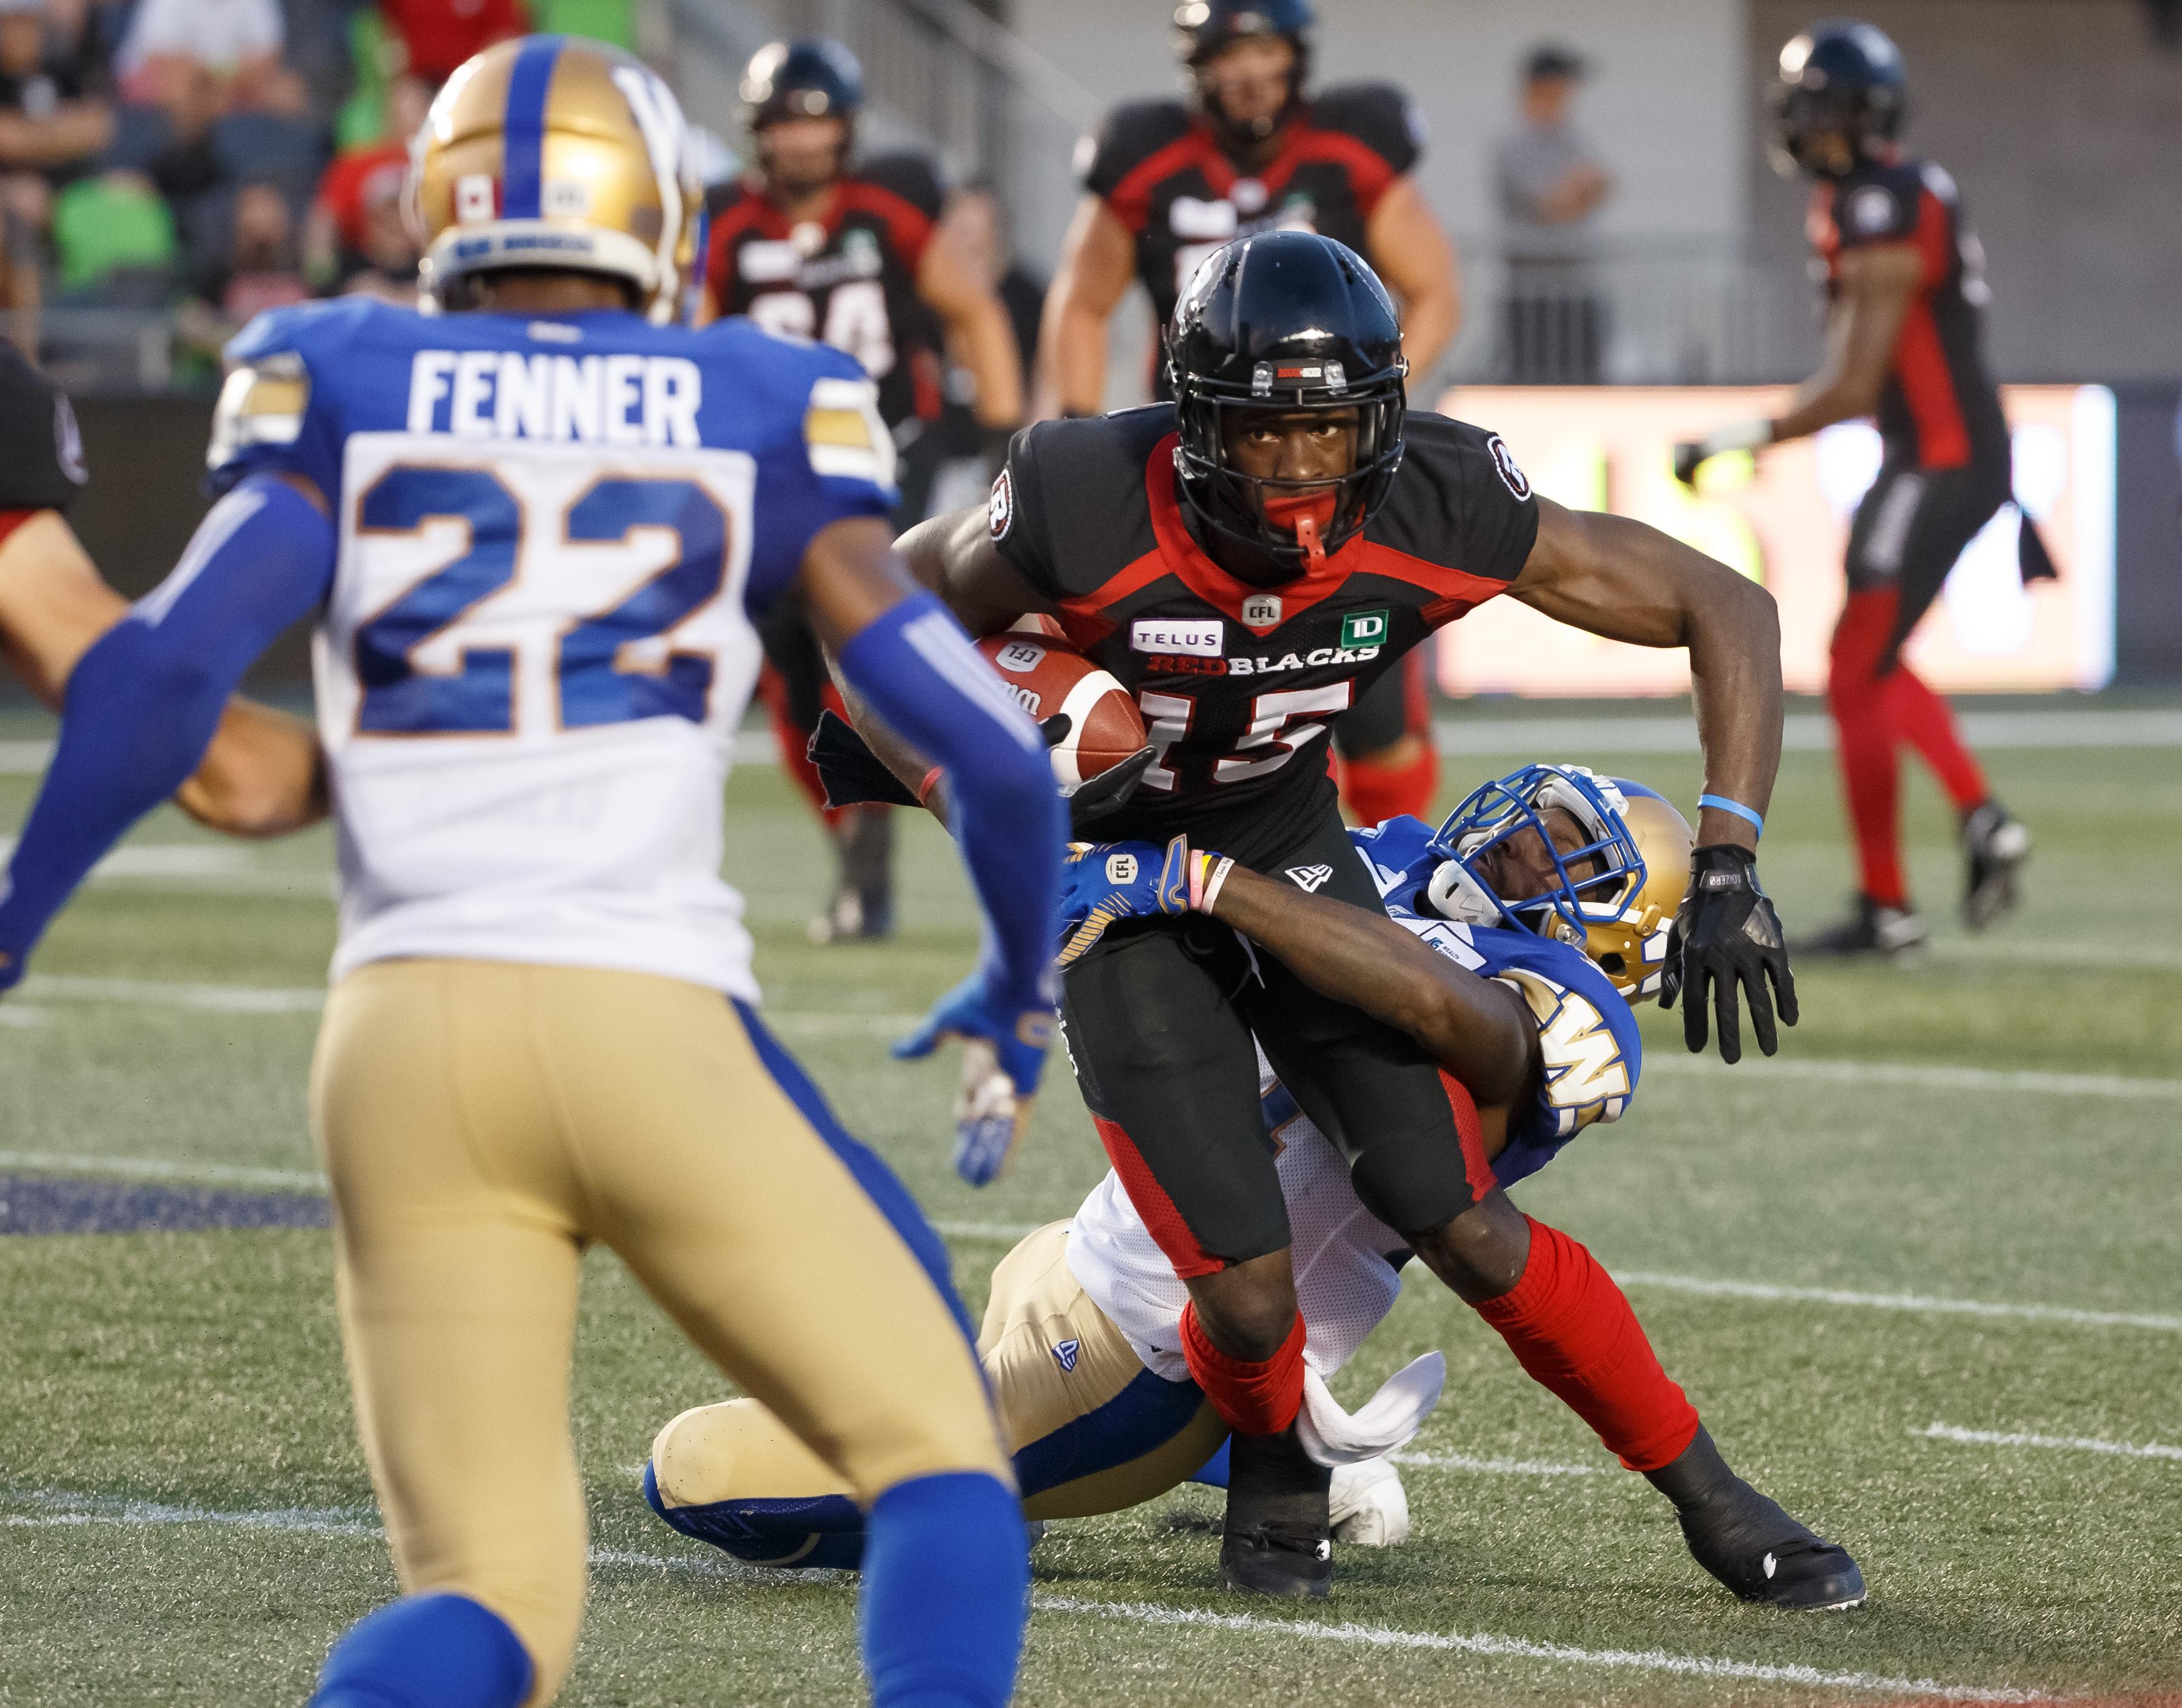 Winnipeg Bluebombers vs Ottawa REDBLACKS July 5, 2019 - PHOTO: Andre Ringuette/Freestyle Photography